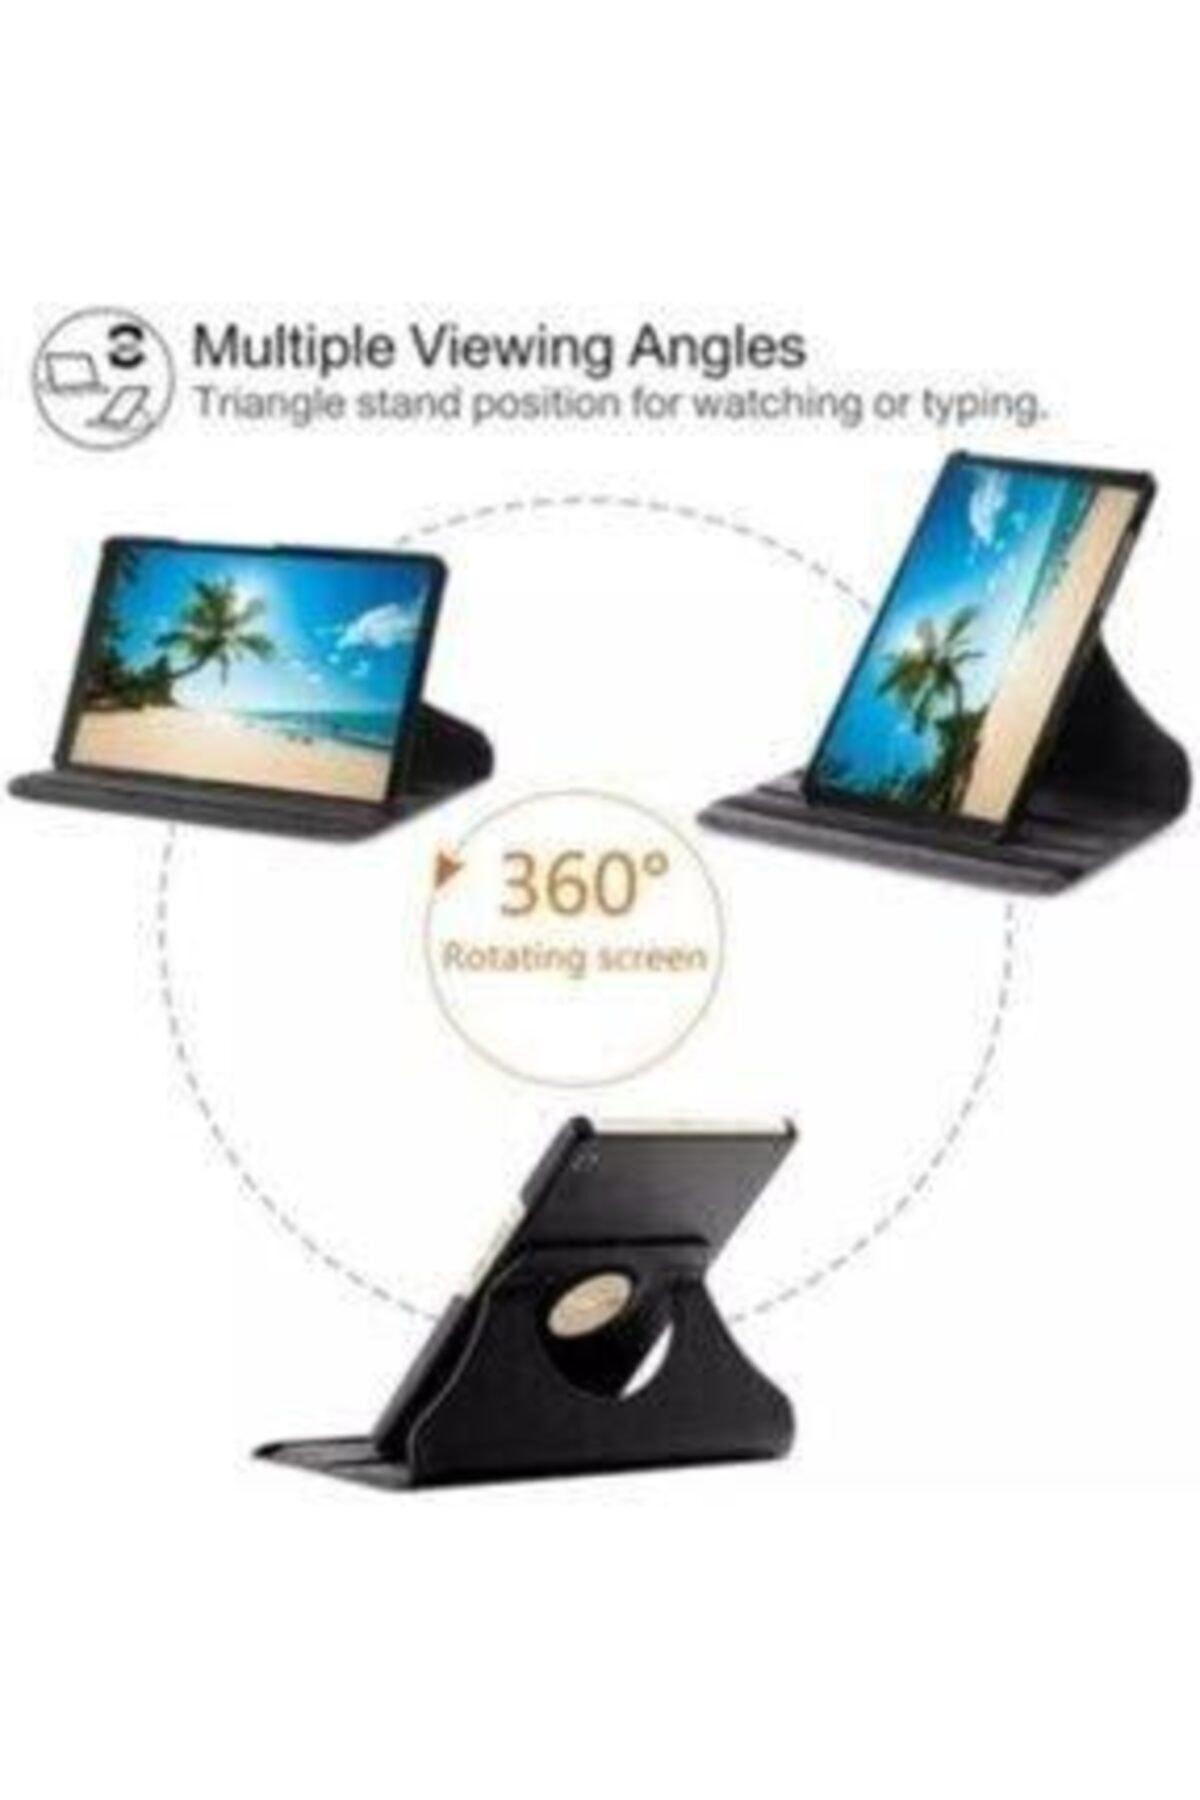 "E TicaShop Pembe Galaxy Tab A7 10.4"" Sm-t500 Sm-t507 Uyumlu Kılıf Set /Kılıf+ Temperli Cam + Kalem 2"